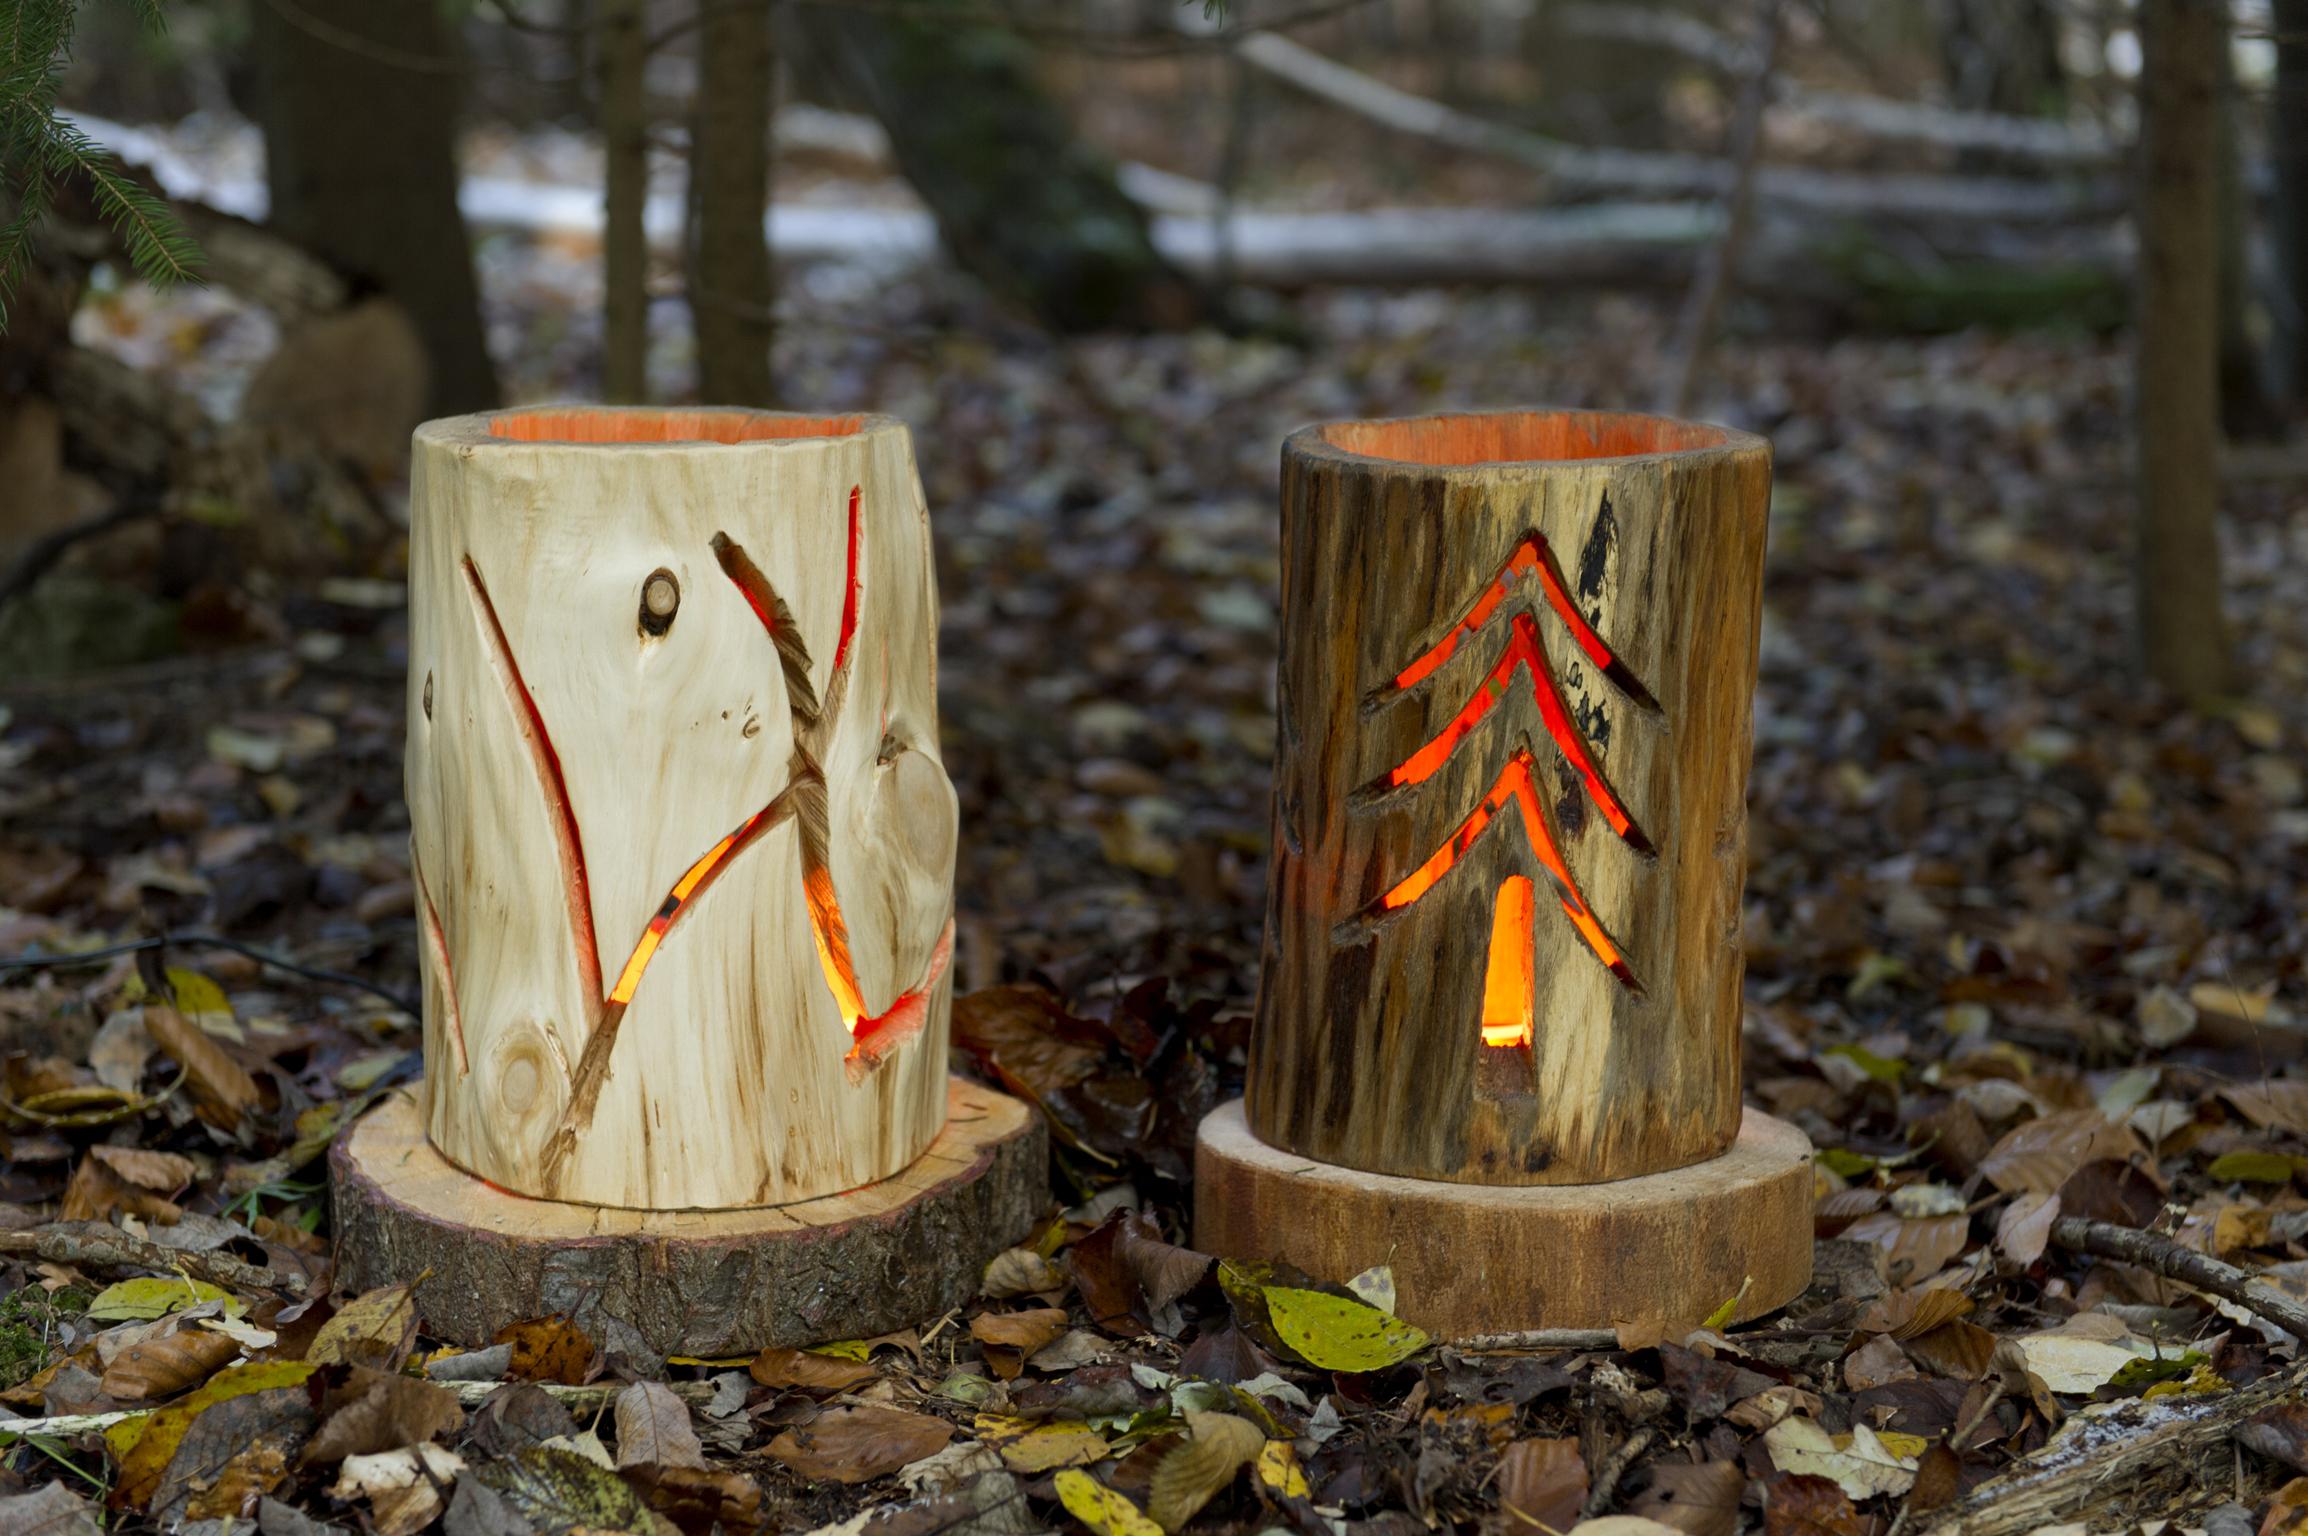 Holz Laterne Bauen Toolporn